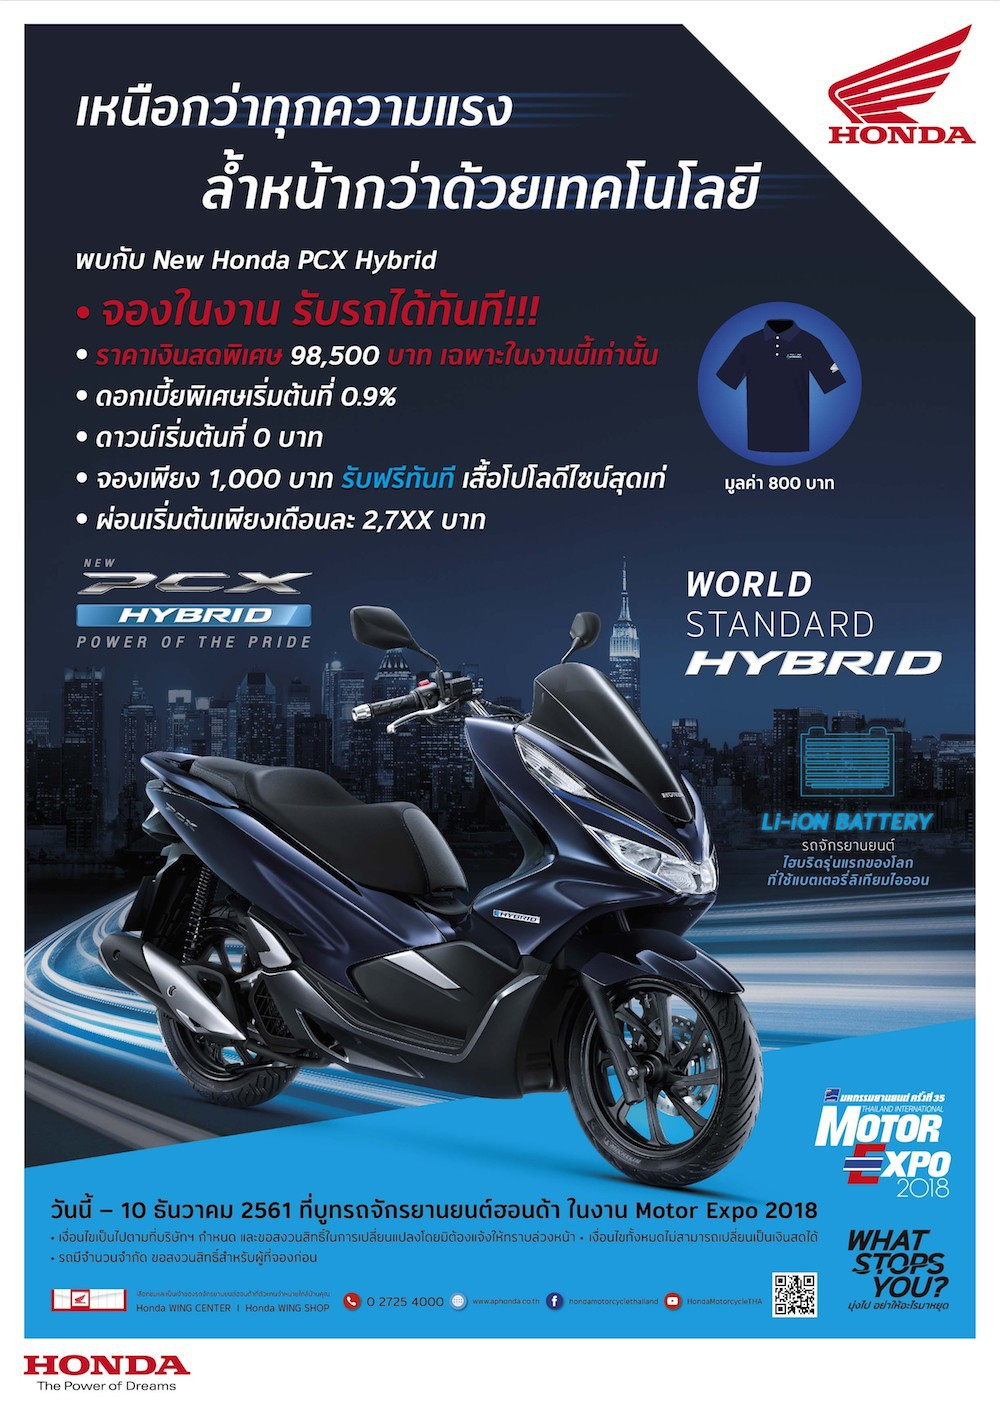 Honda-ฮอนด้า-โปรโมชั่น-ข่าวประชาสัมพันธ์-commuterbike-promotion-motorexpo2018-20181127